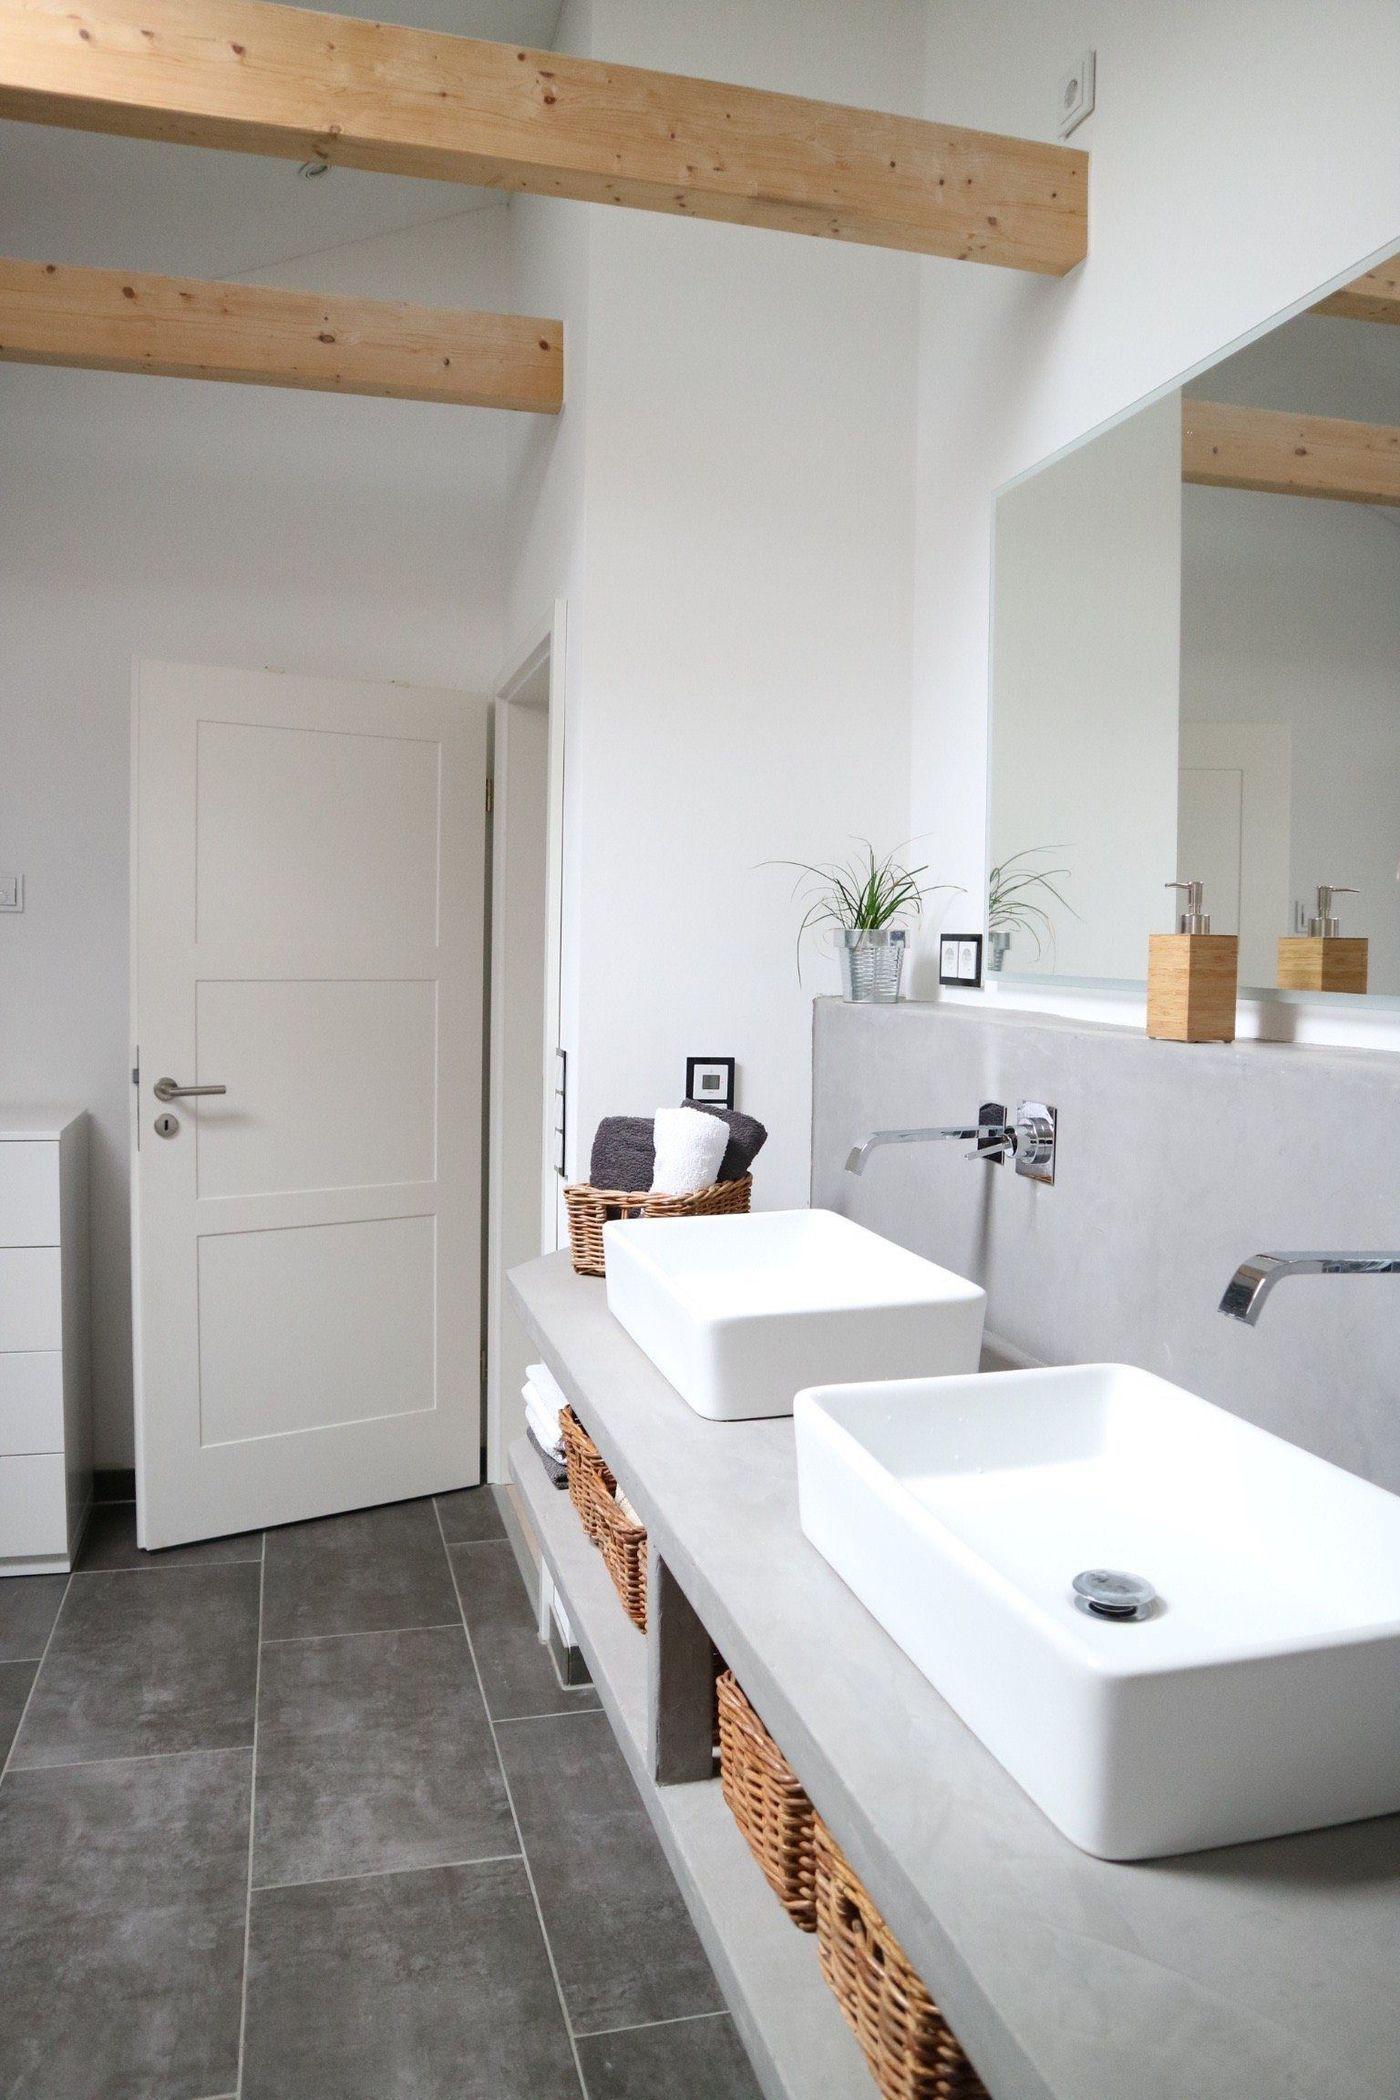 UNIQUE DECOR IDEAS: LET'S TURN YOUR BATHROOM INTO BLACK